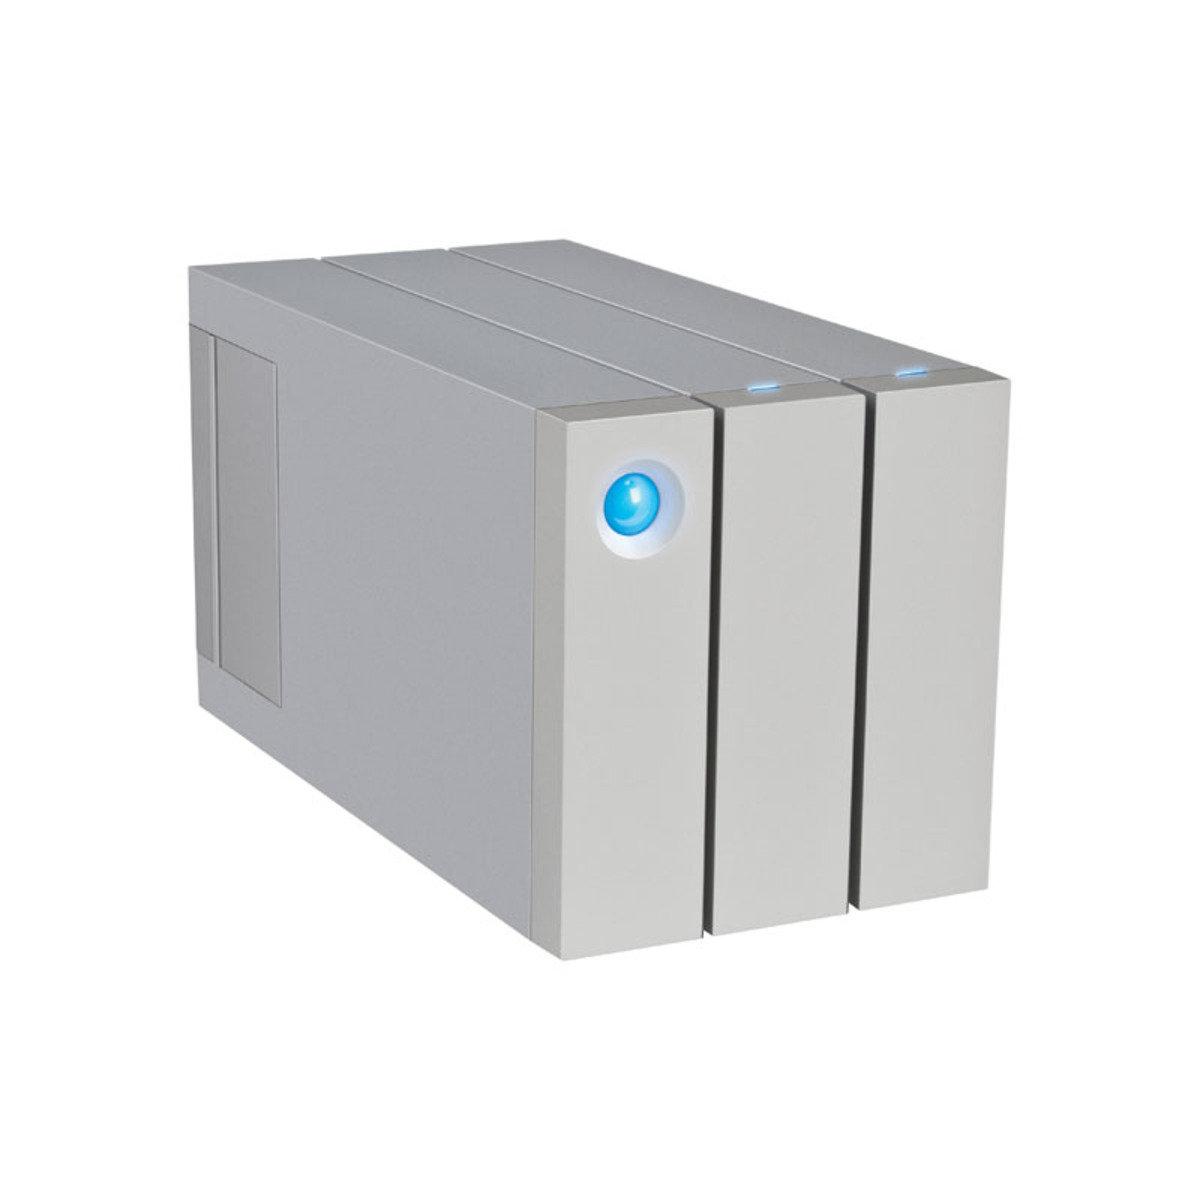 2big Thunderbolt 2 6TB 3.5吋 雙硬碟RAID外置硬碟 9000437U